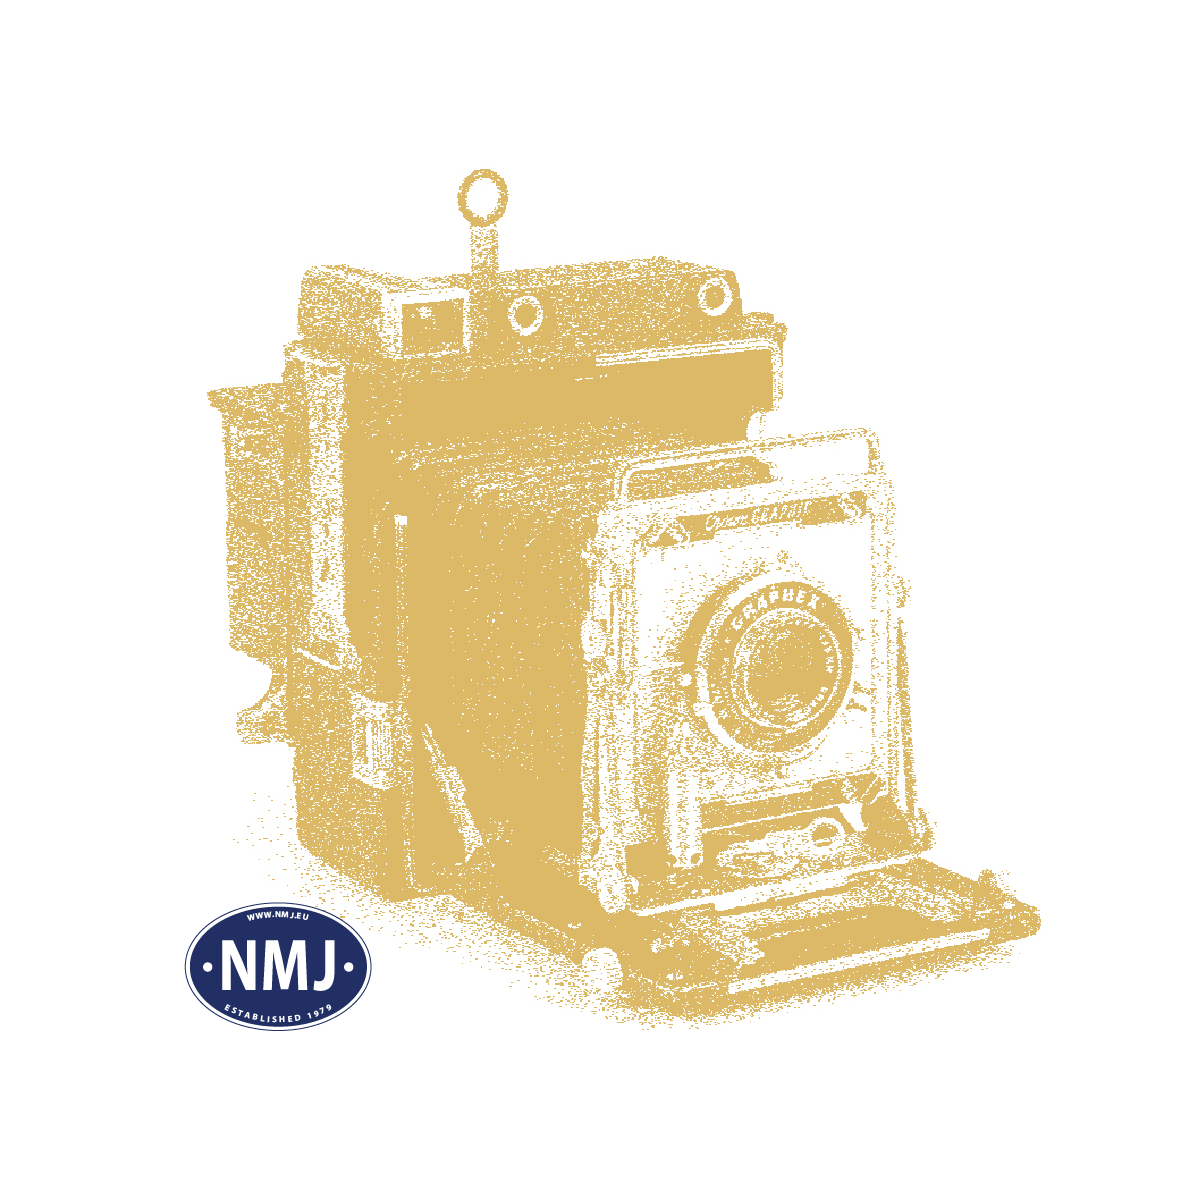 NMJT130.102 - NMJ Topline NSB B3-2 25510 type 3, Old red/brown design